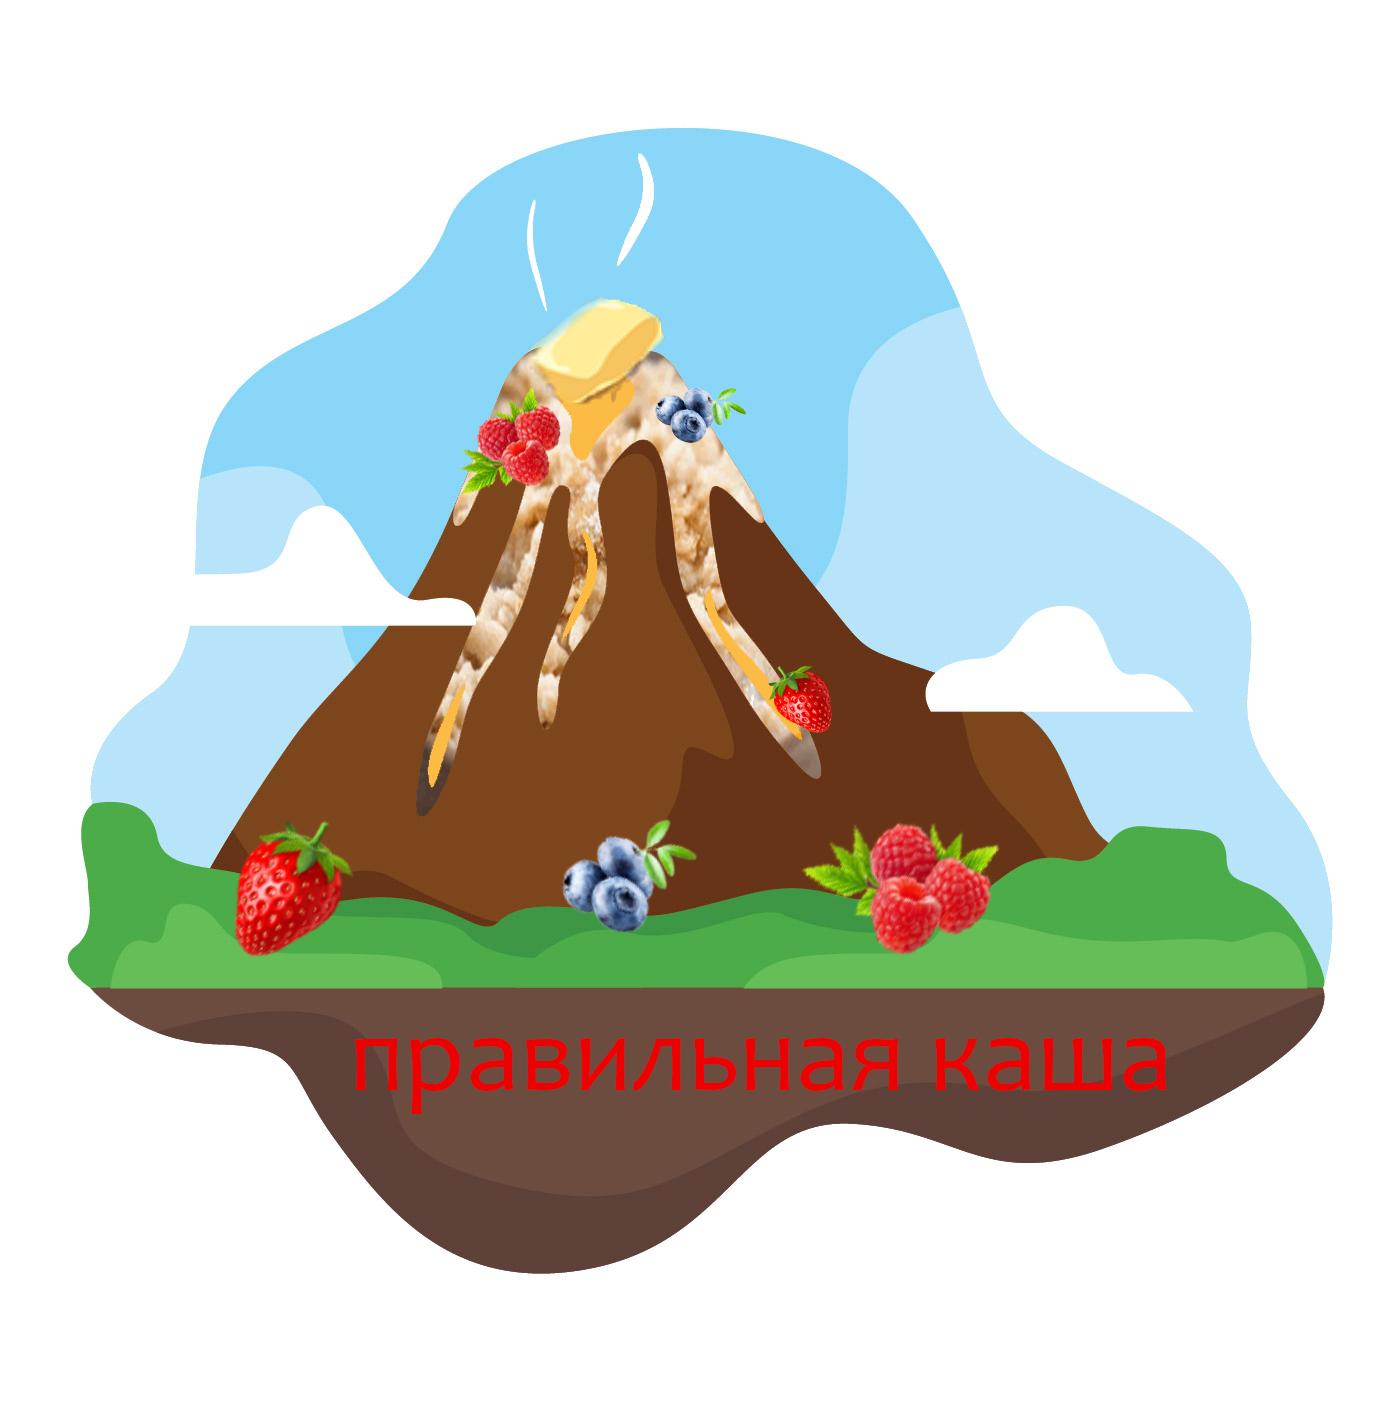 Веб-дизайнер, создание логотипа. фото f_6075ebcfc856fb81.jpg